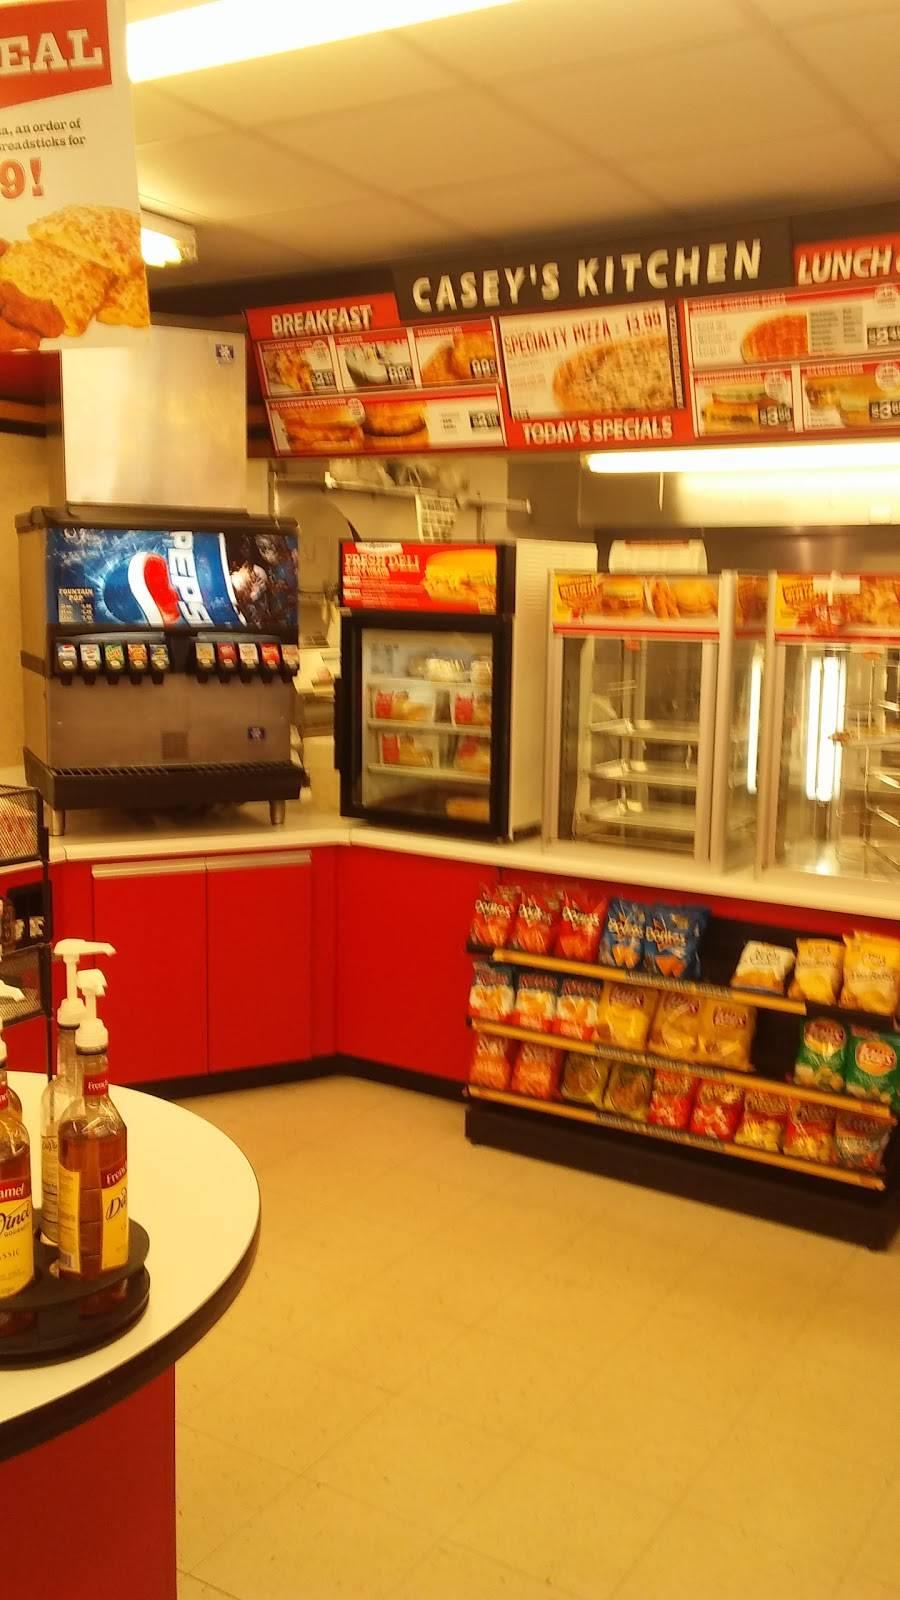 Caseys | meal takeaway | 801 County Rd W #54, Camdenton, MO 65020, USA | 5733463144 OR +1 573-346-3144